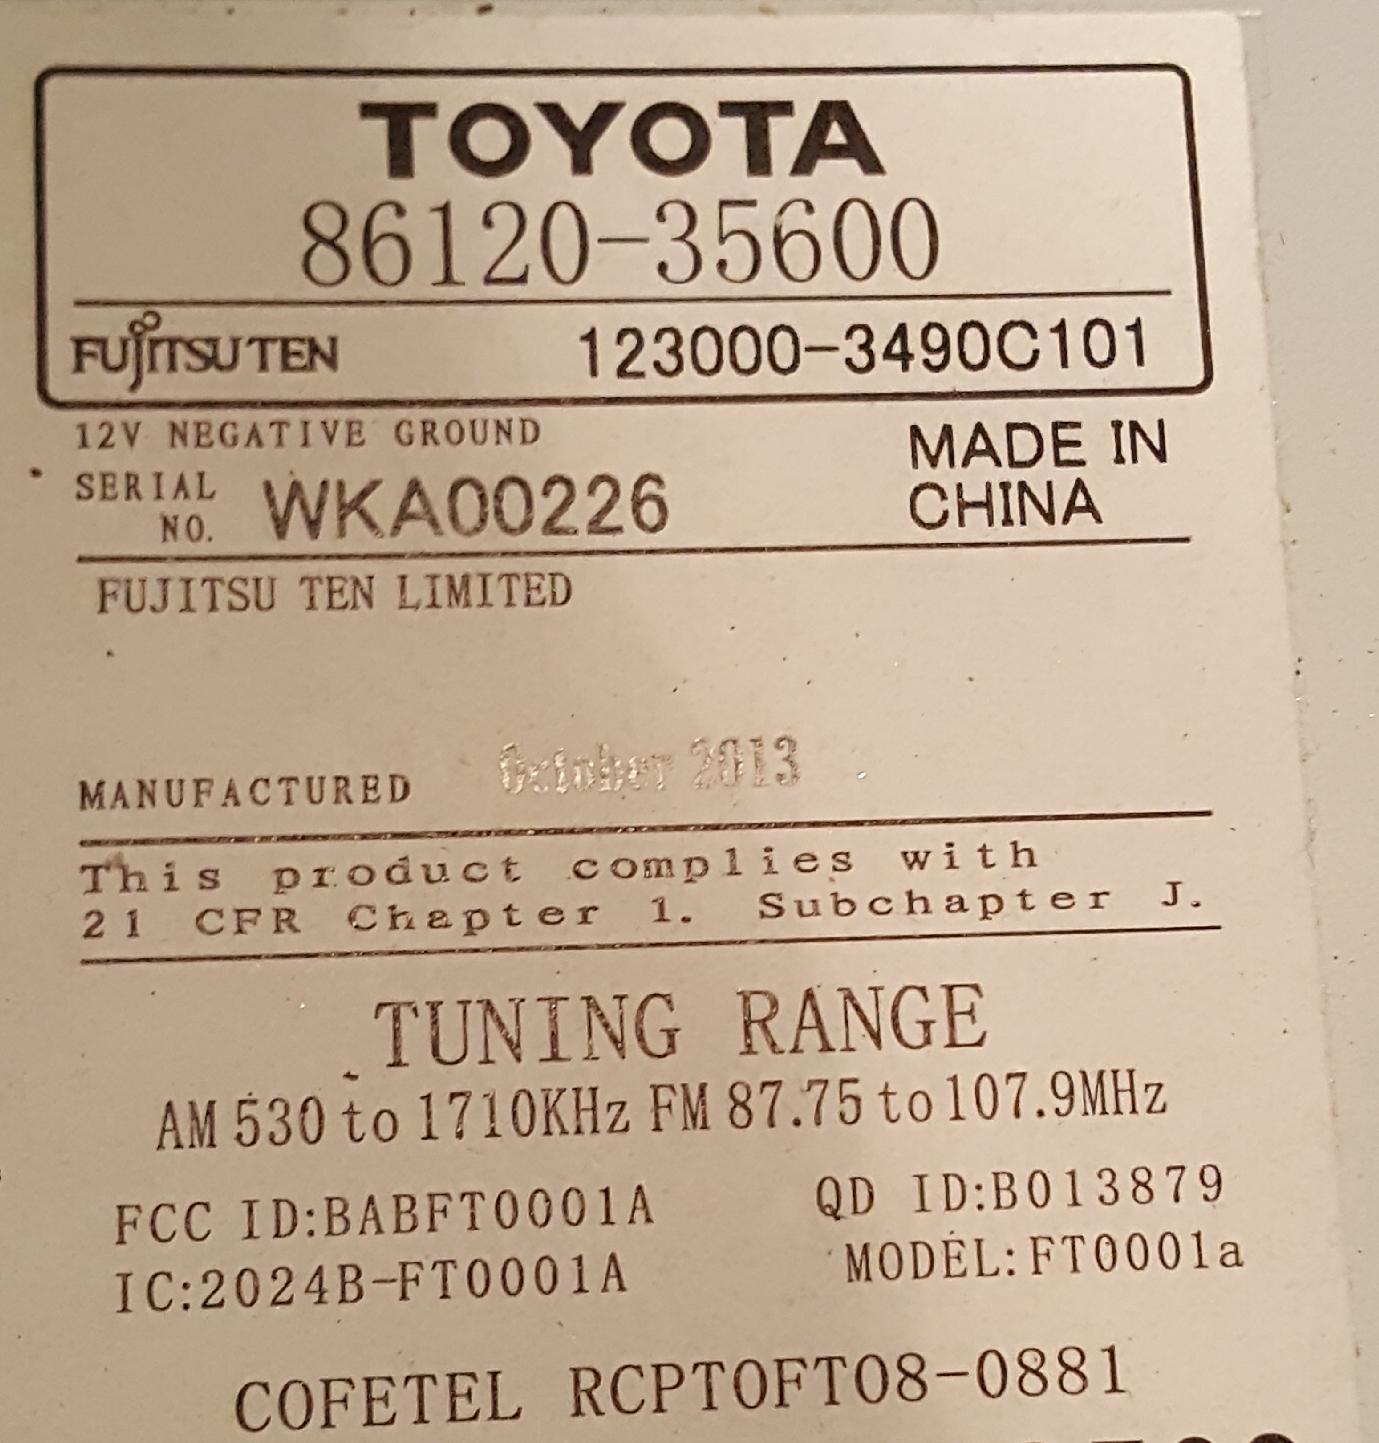 Toyota Fujitsu 86120 14 Wiring Diagram | Wiring Diagram - Toyota 86120 Wiring Diagram